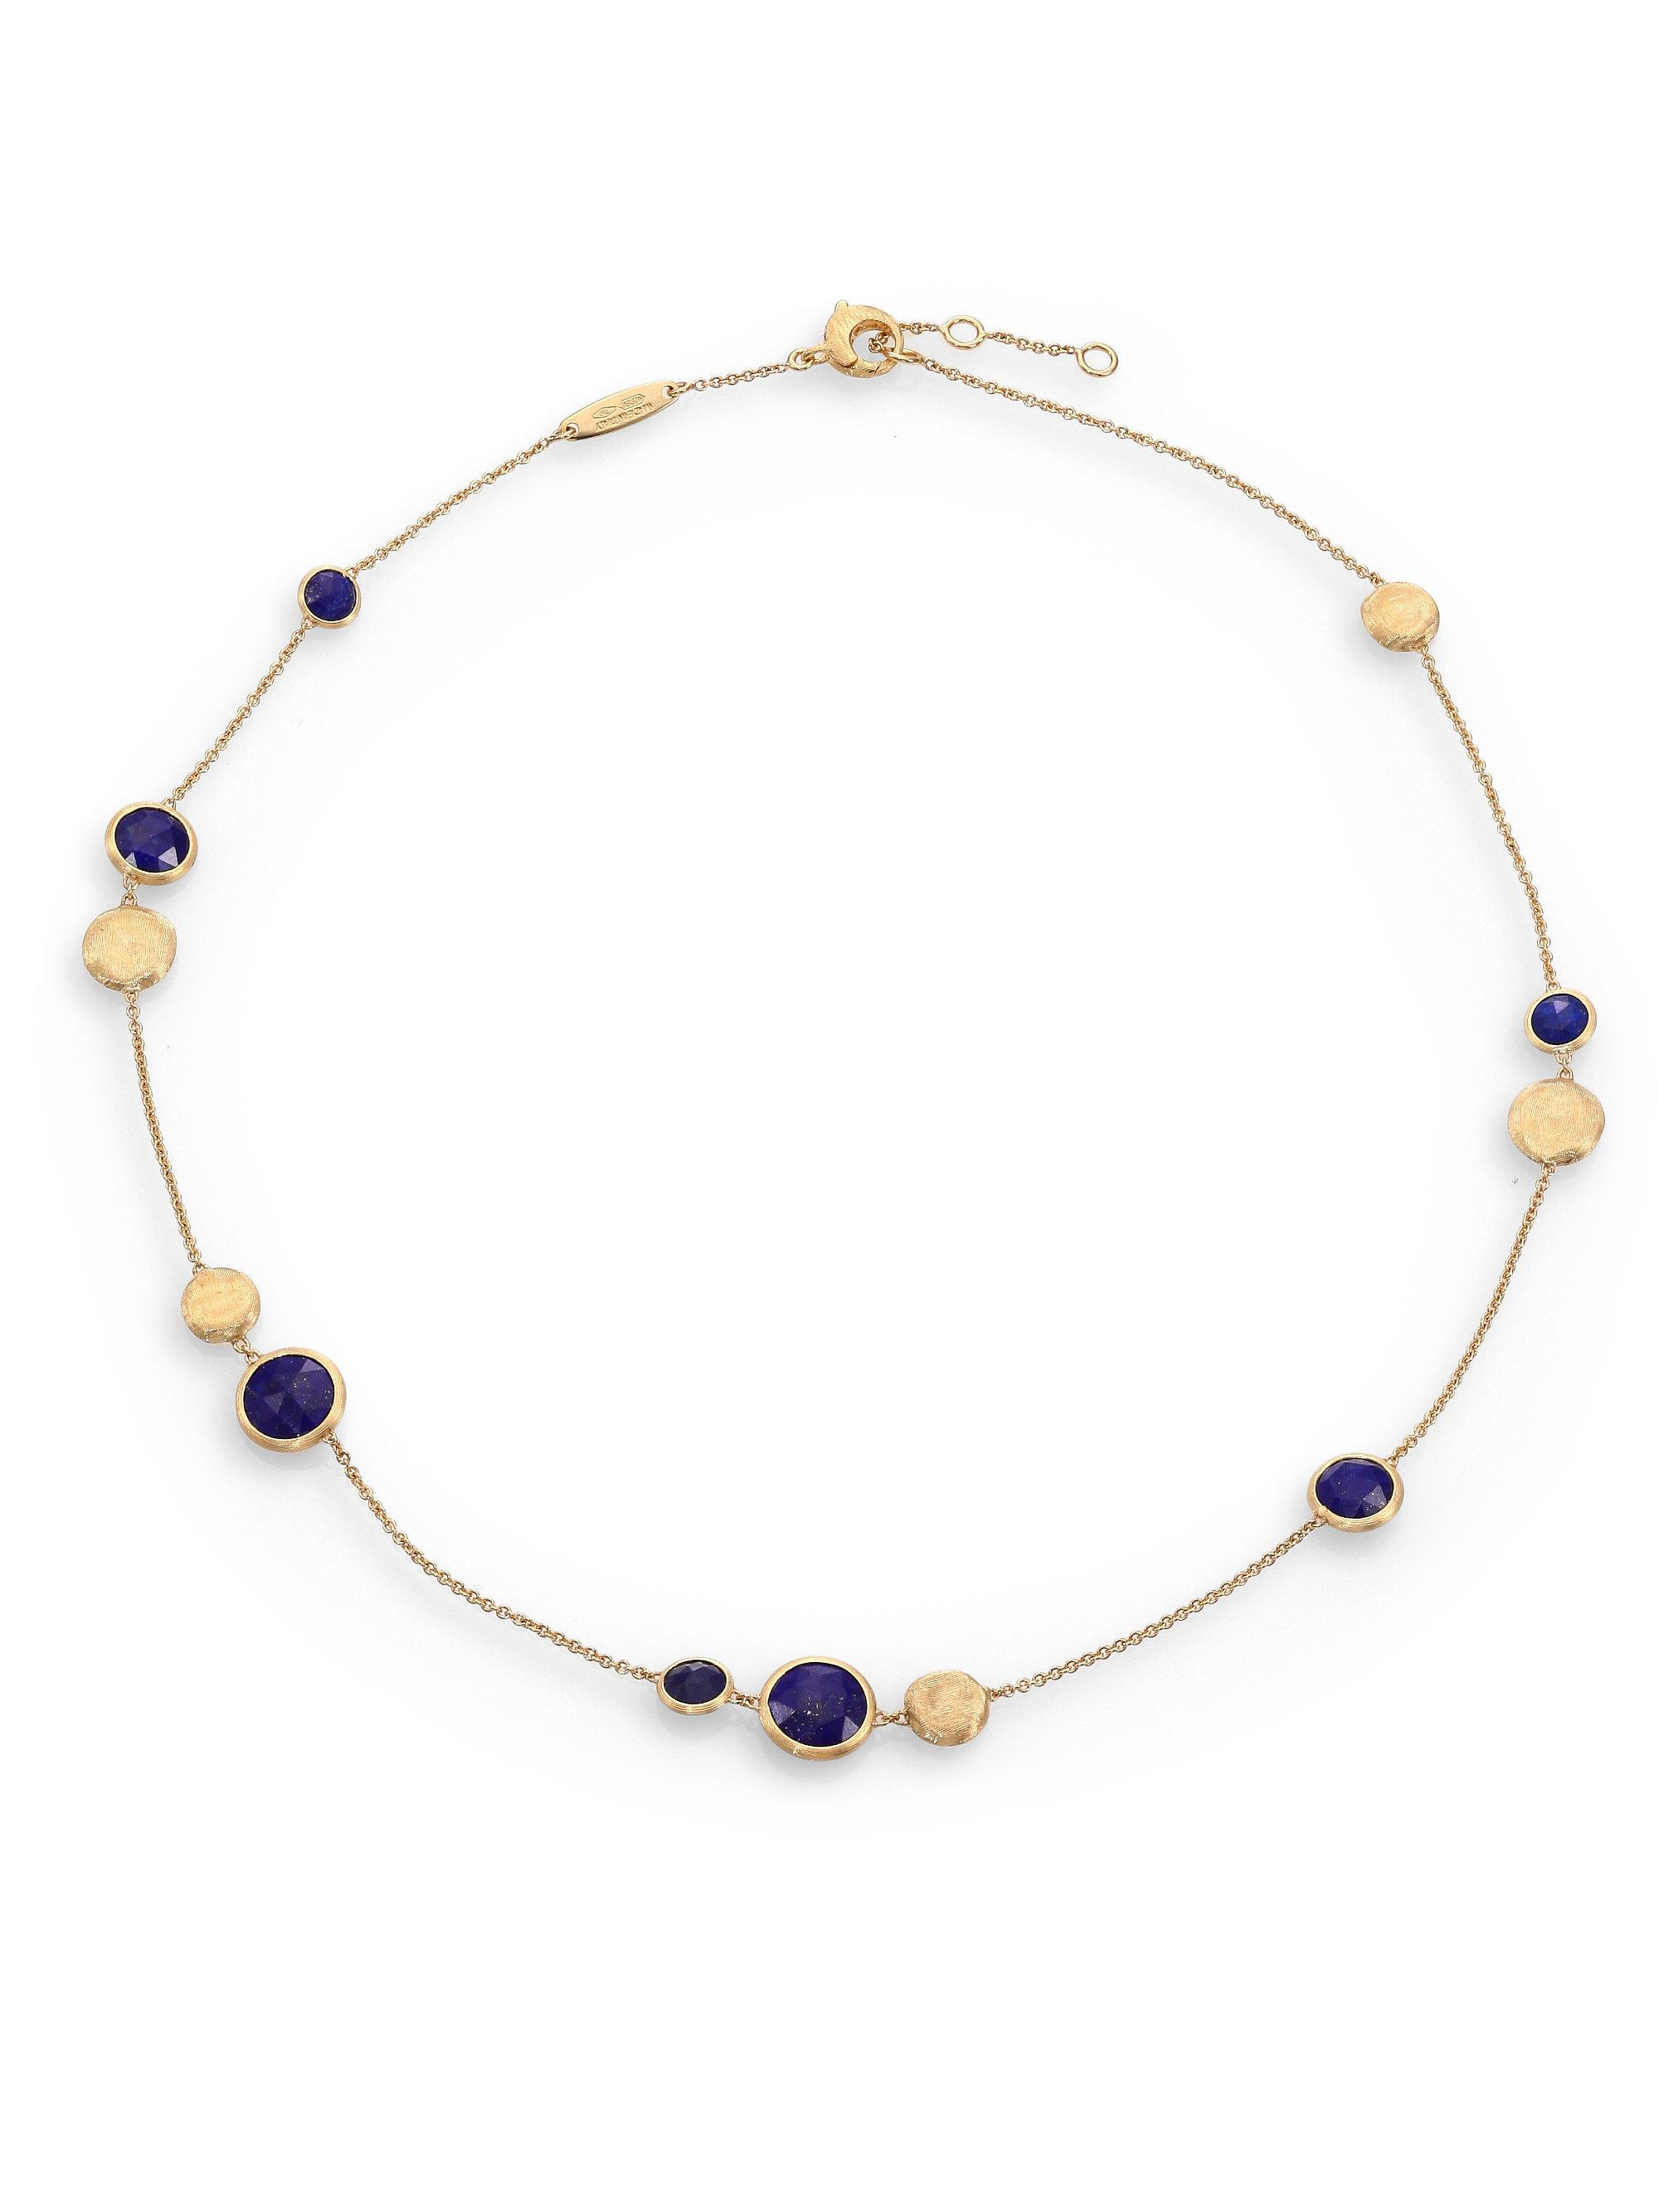 Marco Bicego Jaipur Tourmaline & Amethyst Collar Necklace tMHiMeA7F